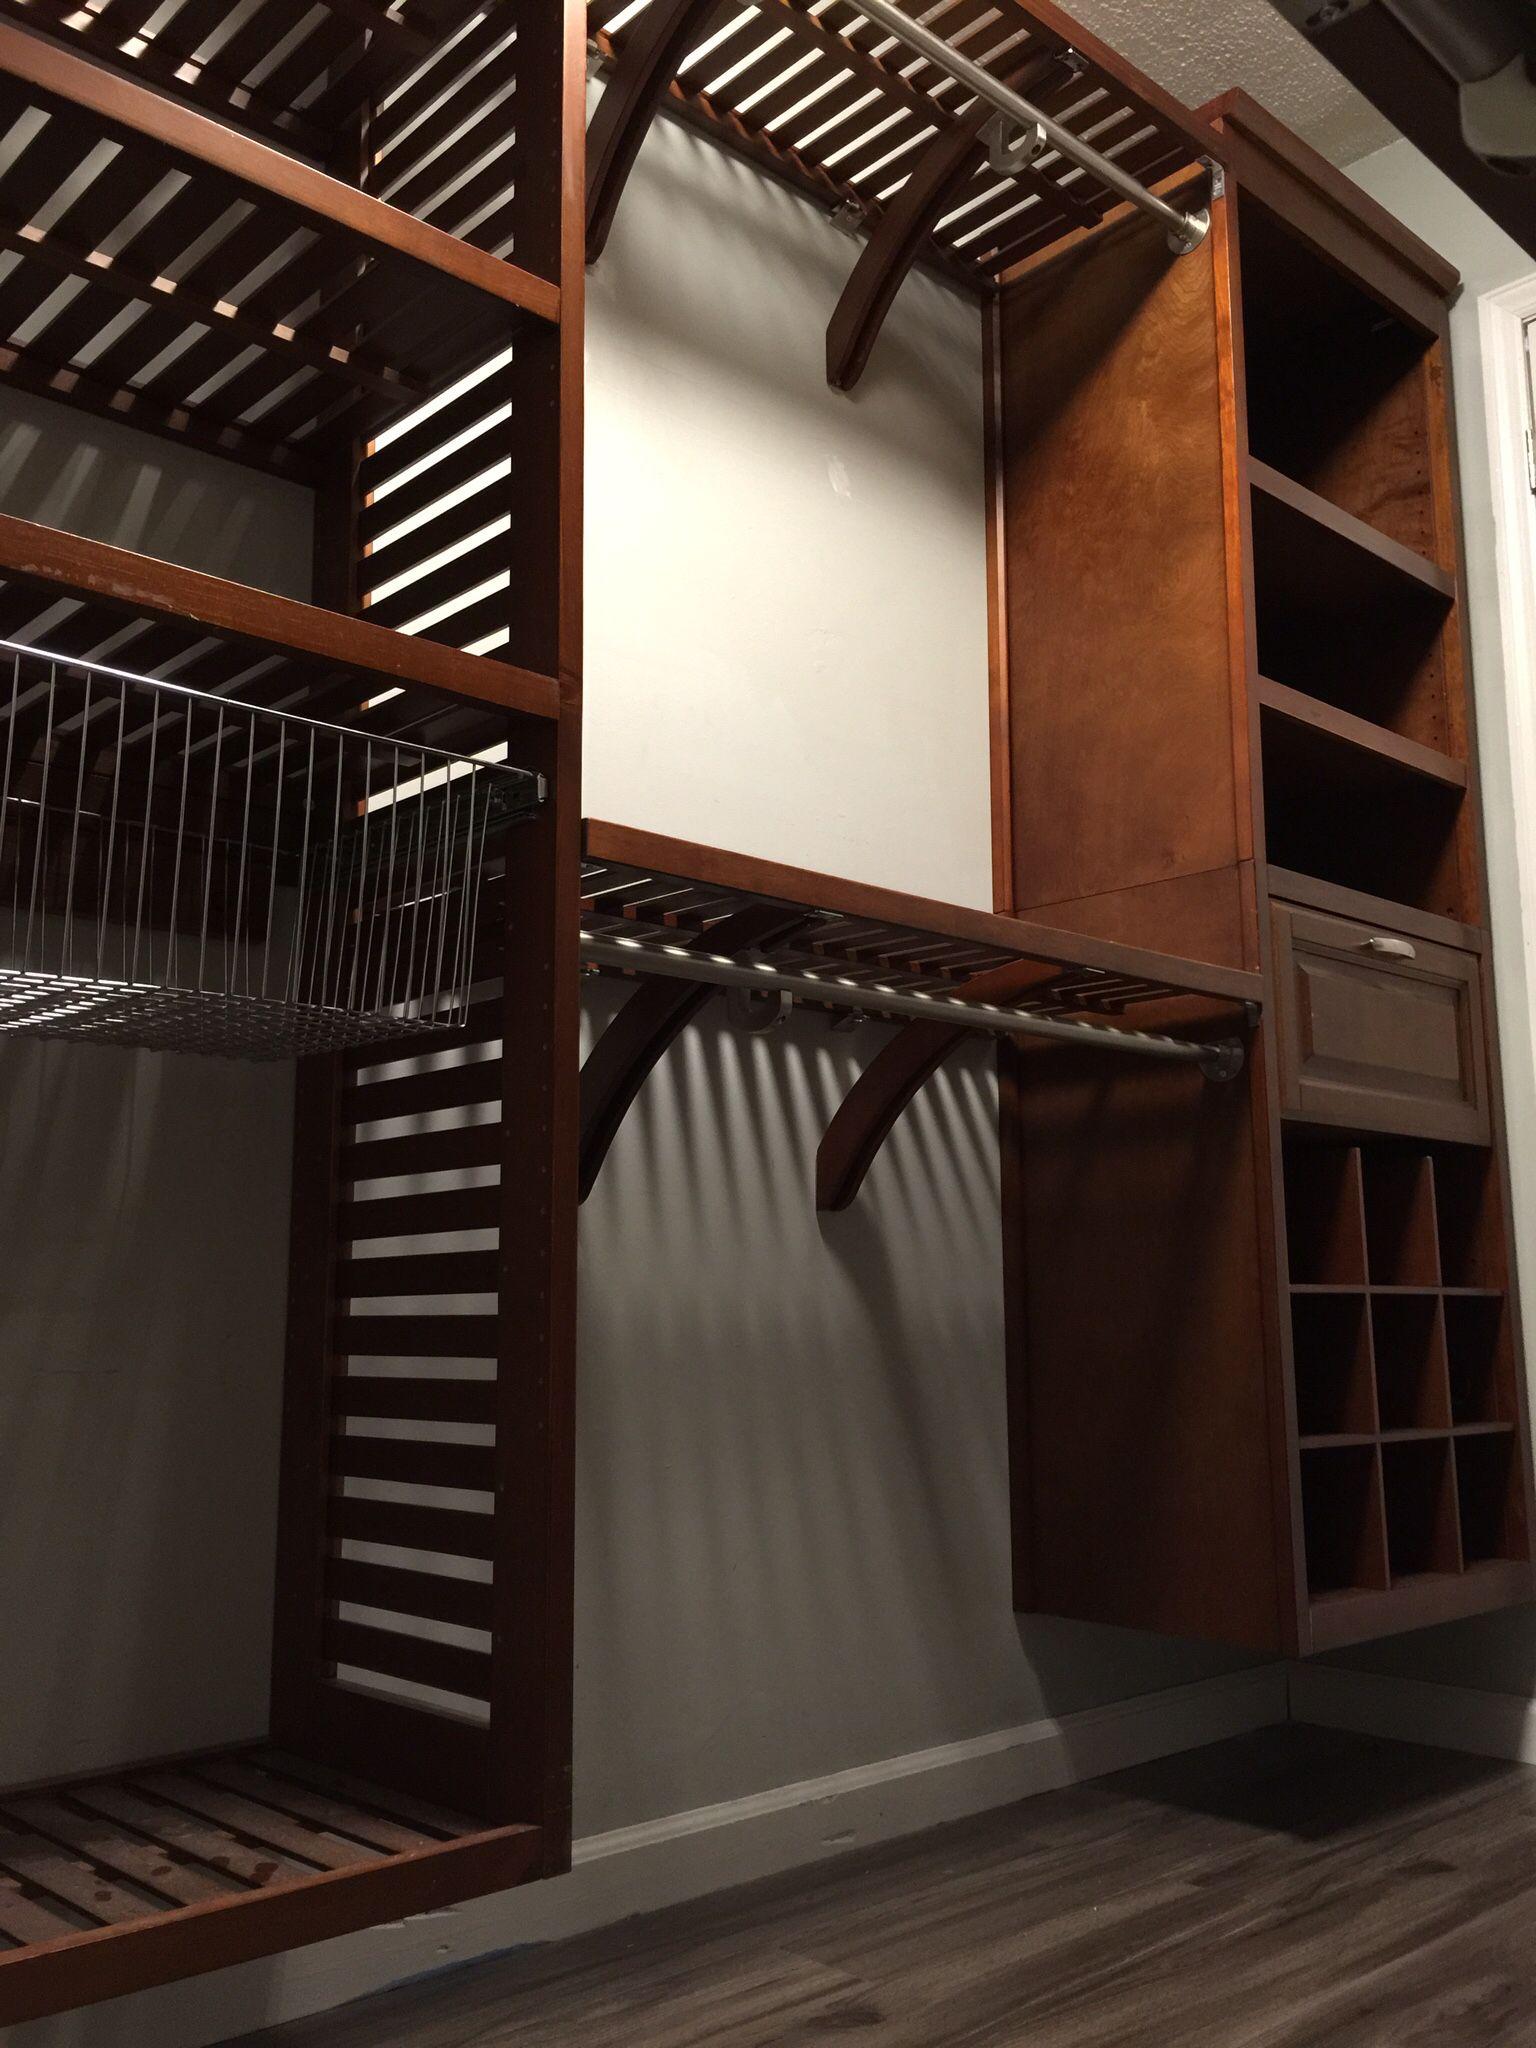 Lowes Closet Design : lowes, closet, design, Allen, Closet, Lowes, System,